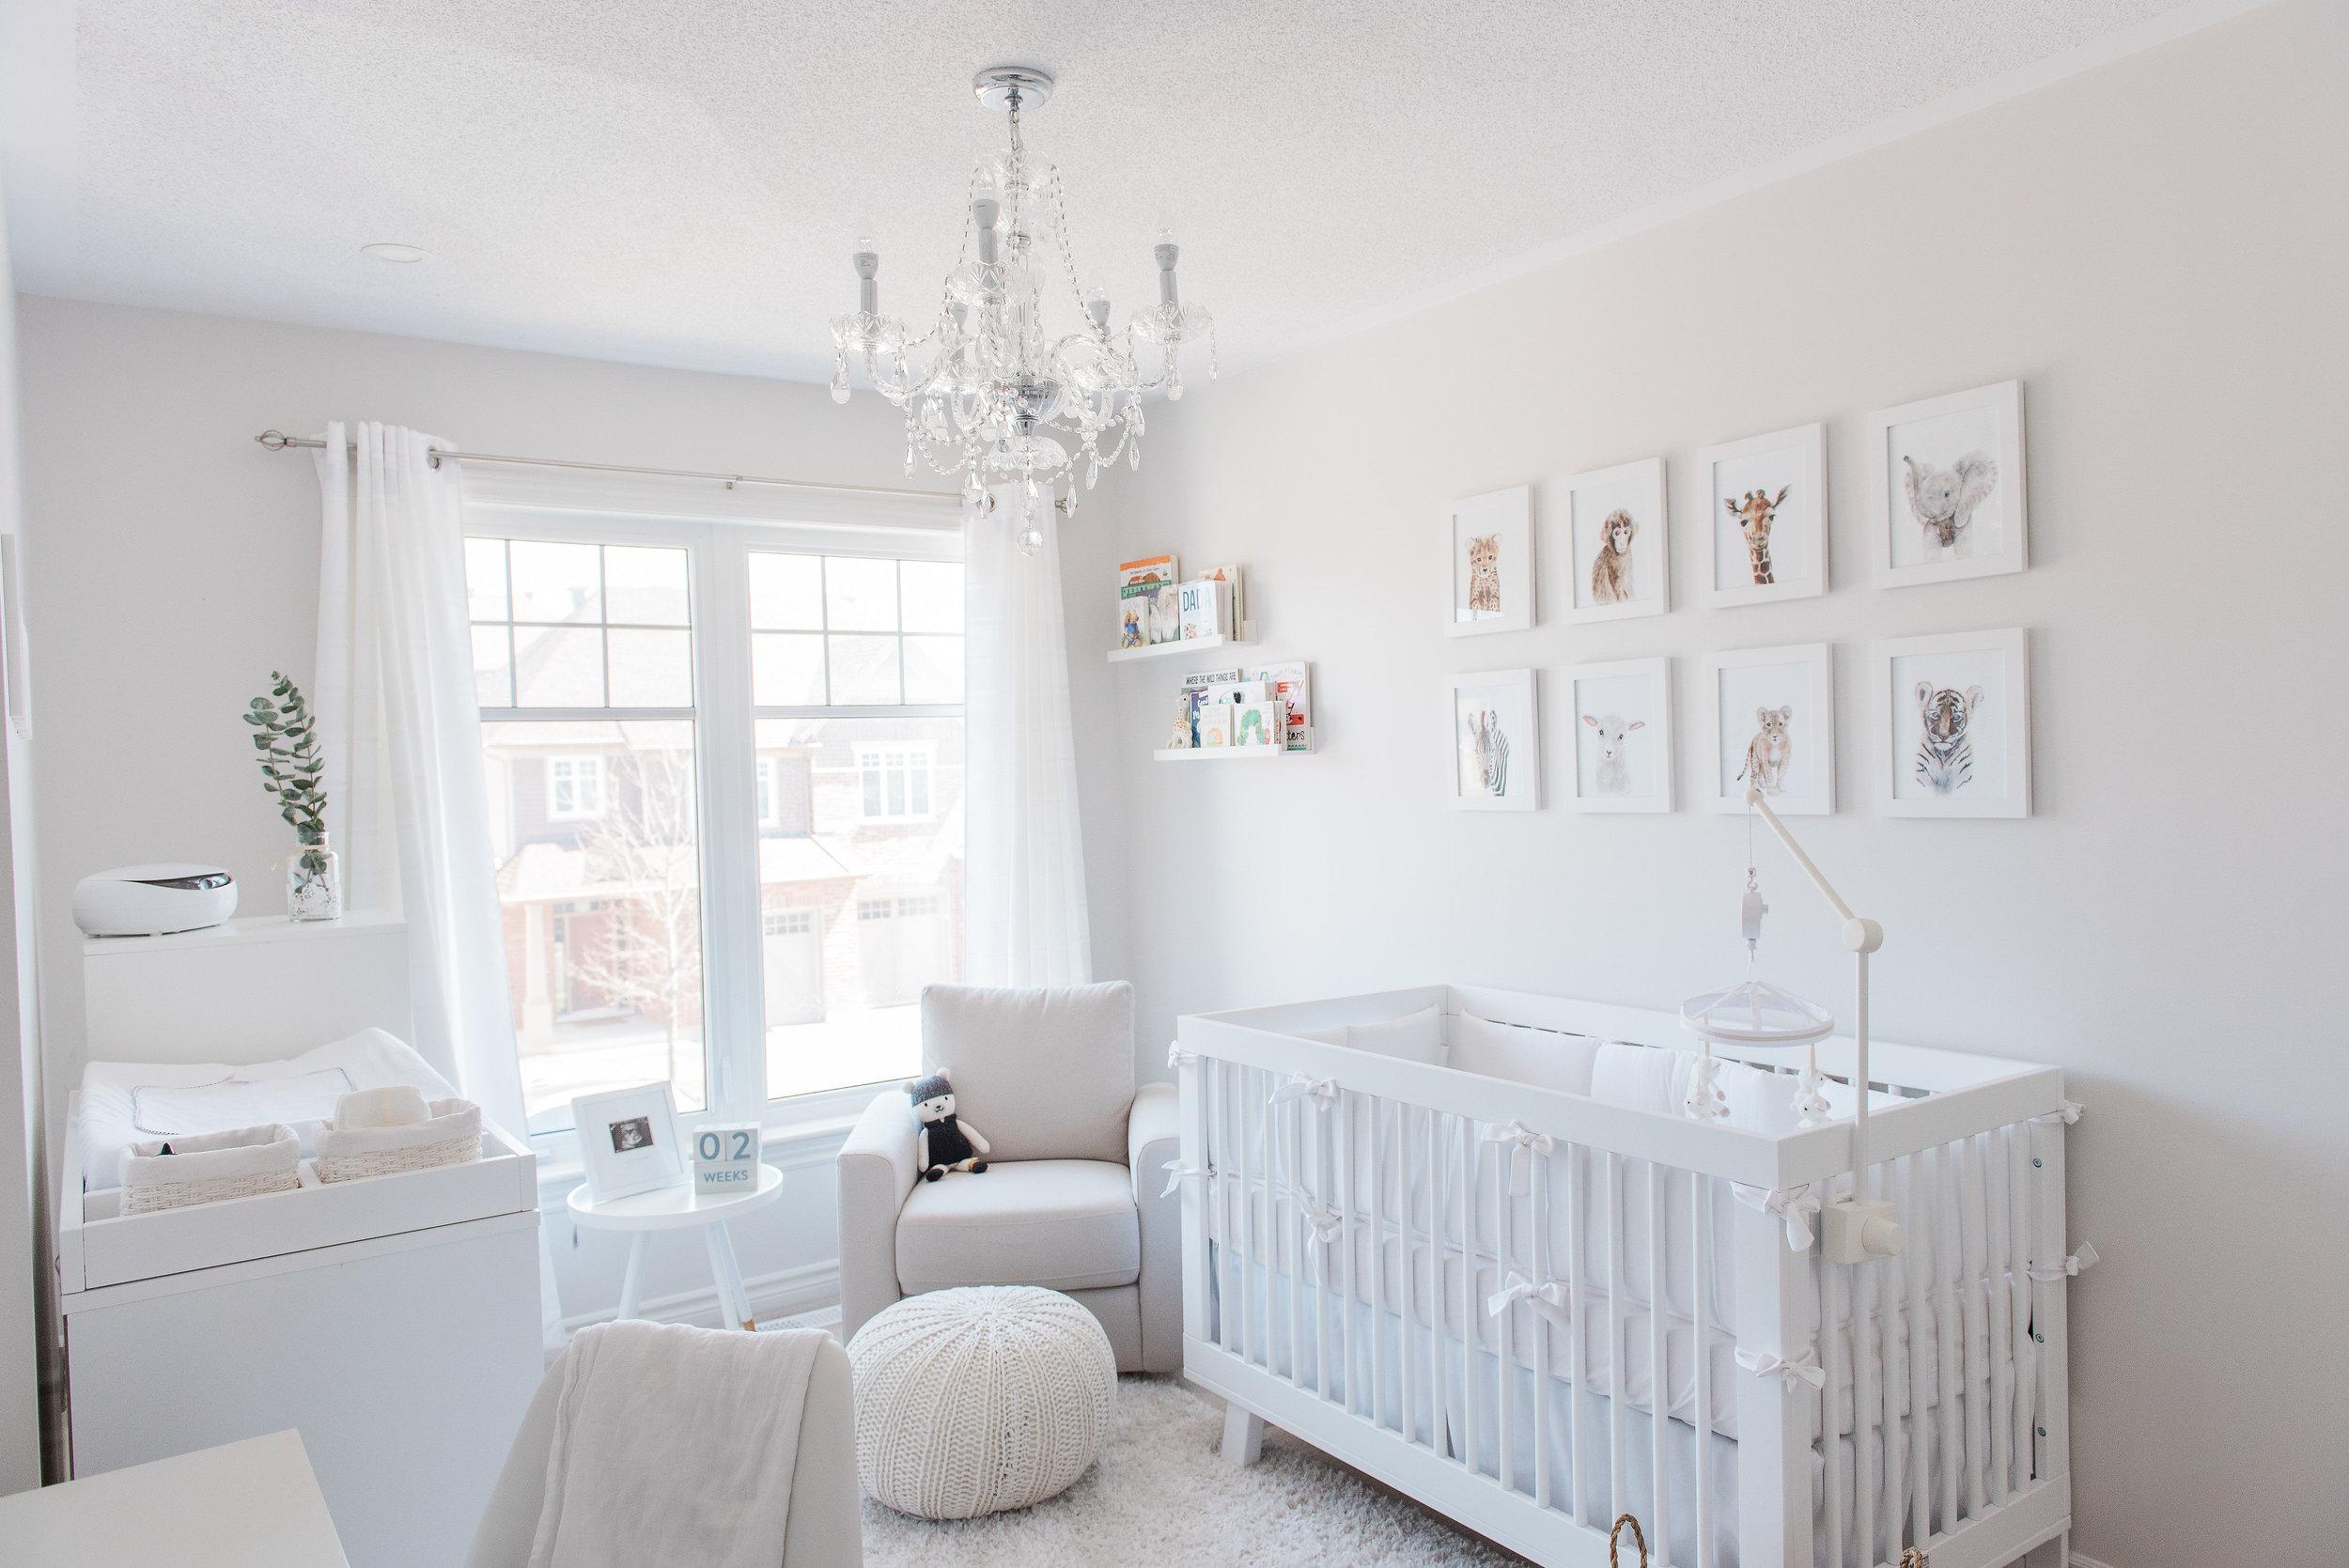 0001_Newborn_Lifestyle___All_White_Nursery_Baby_Boy___Hanan.jpg